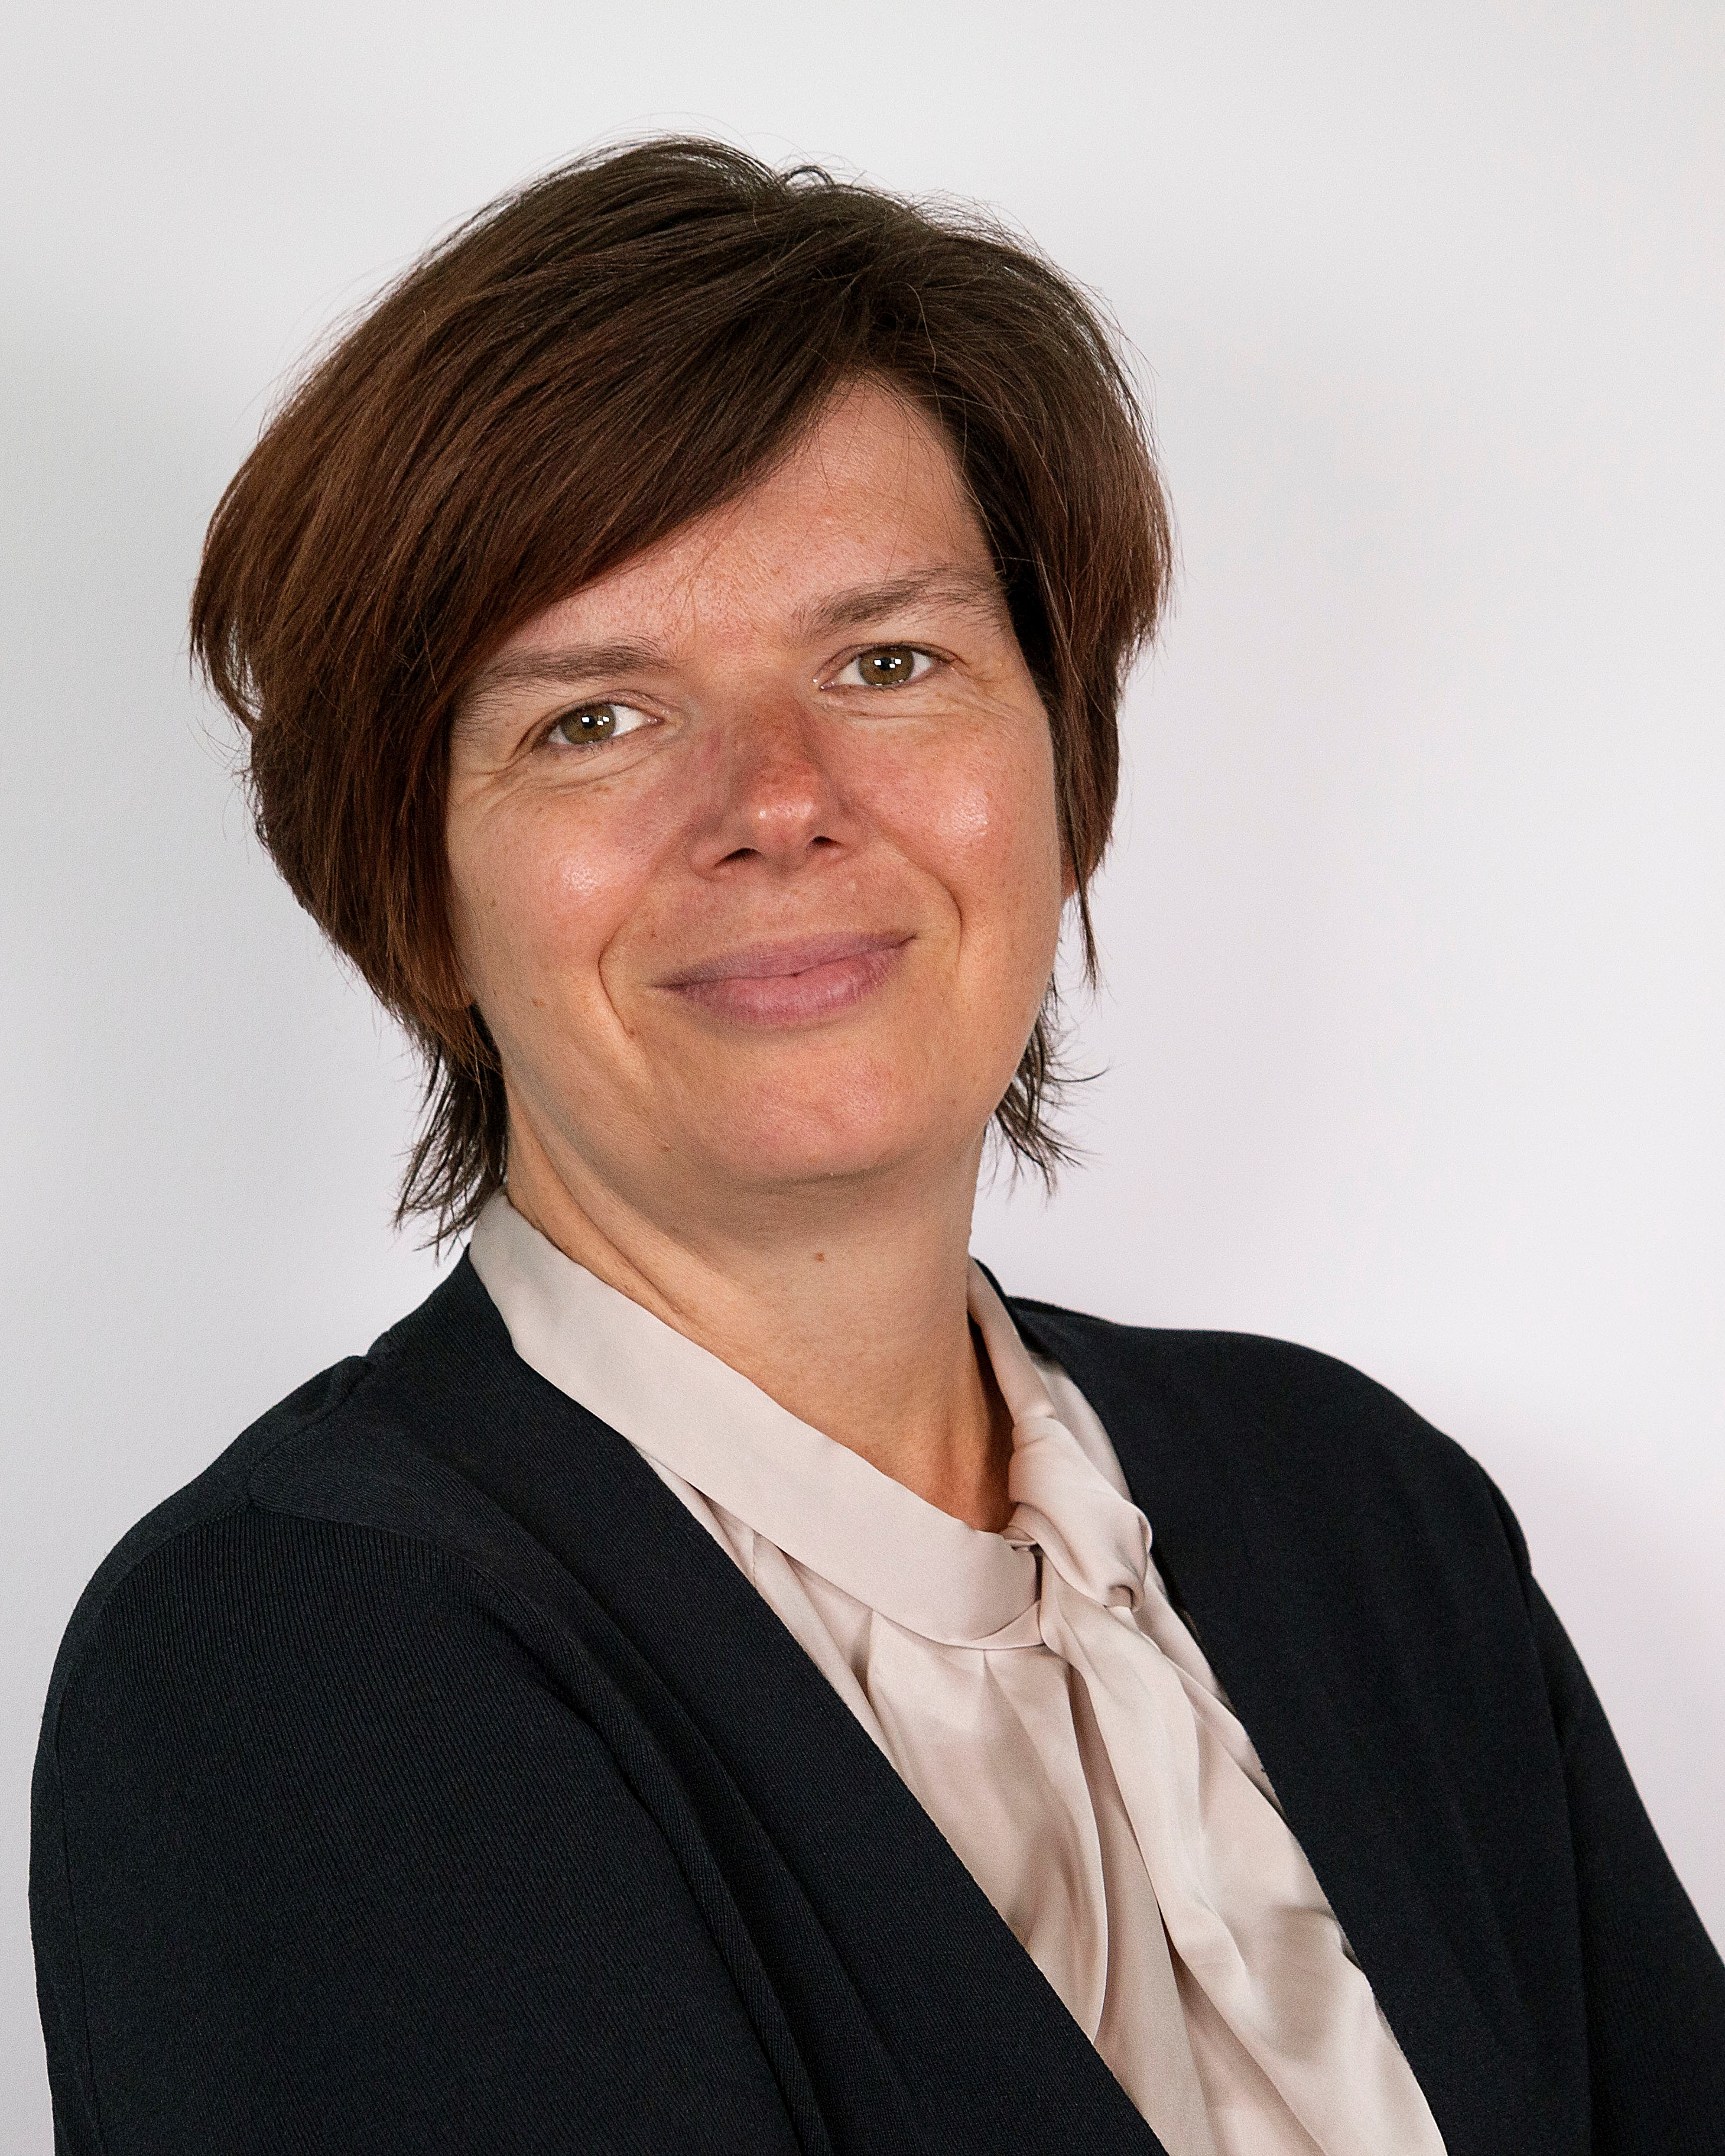 Daniela Karbe-Geßler